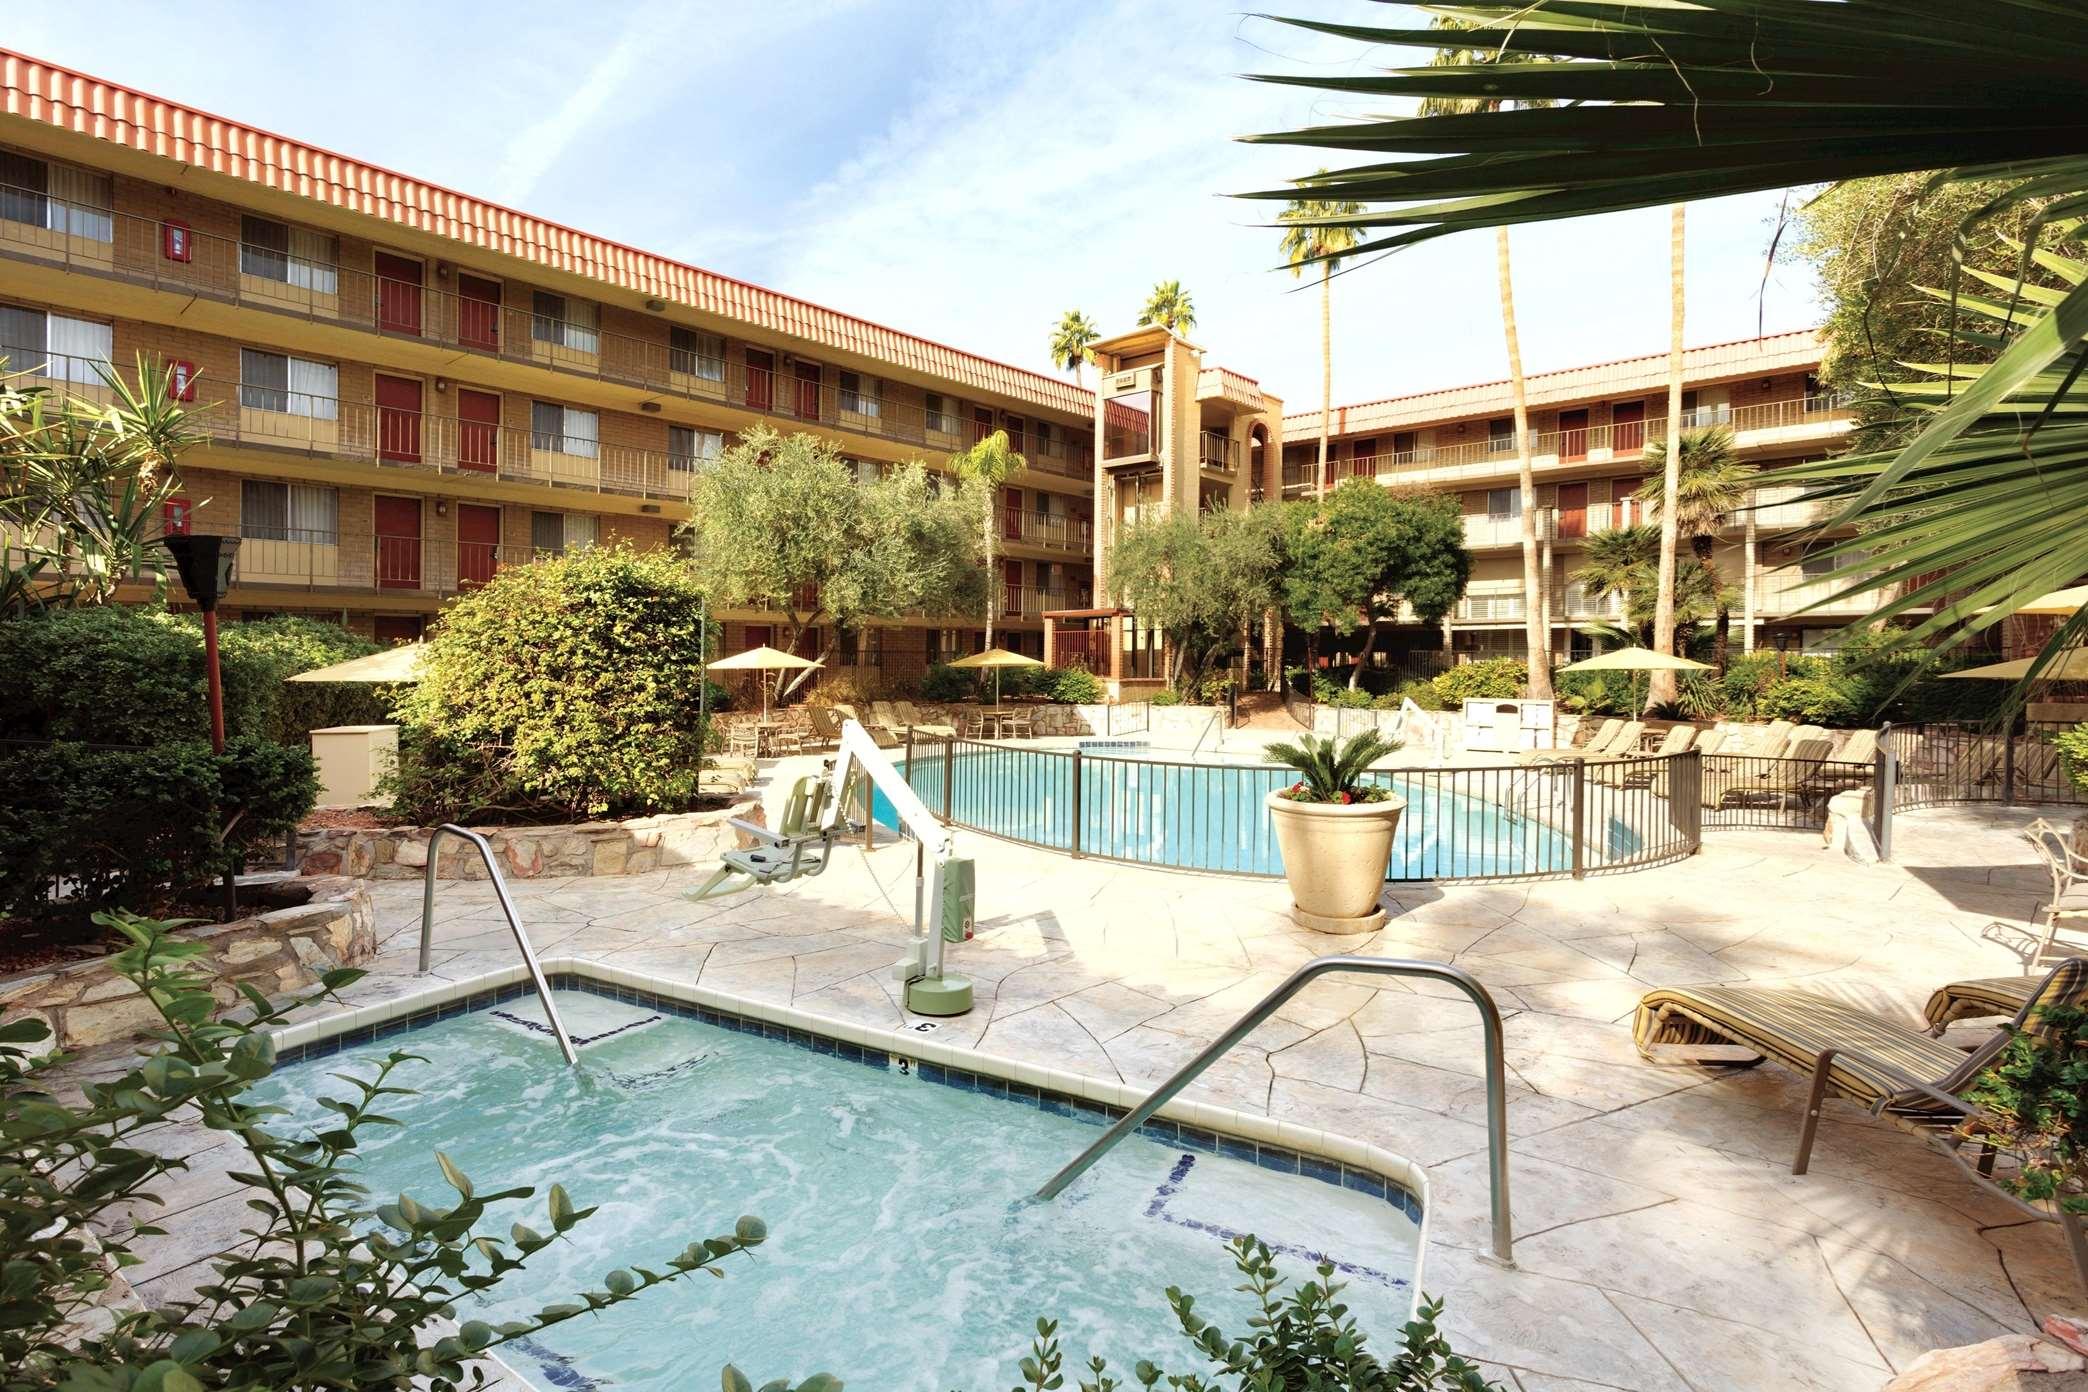 Hilton Hotel Near Phoenix Arizona Airport